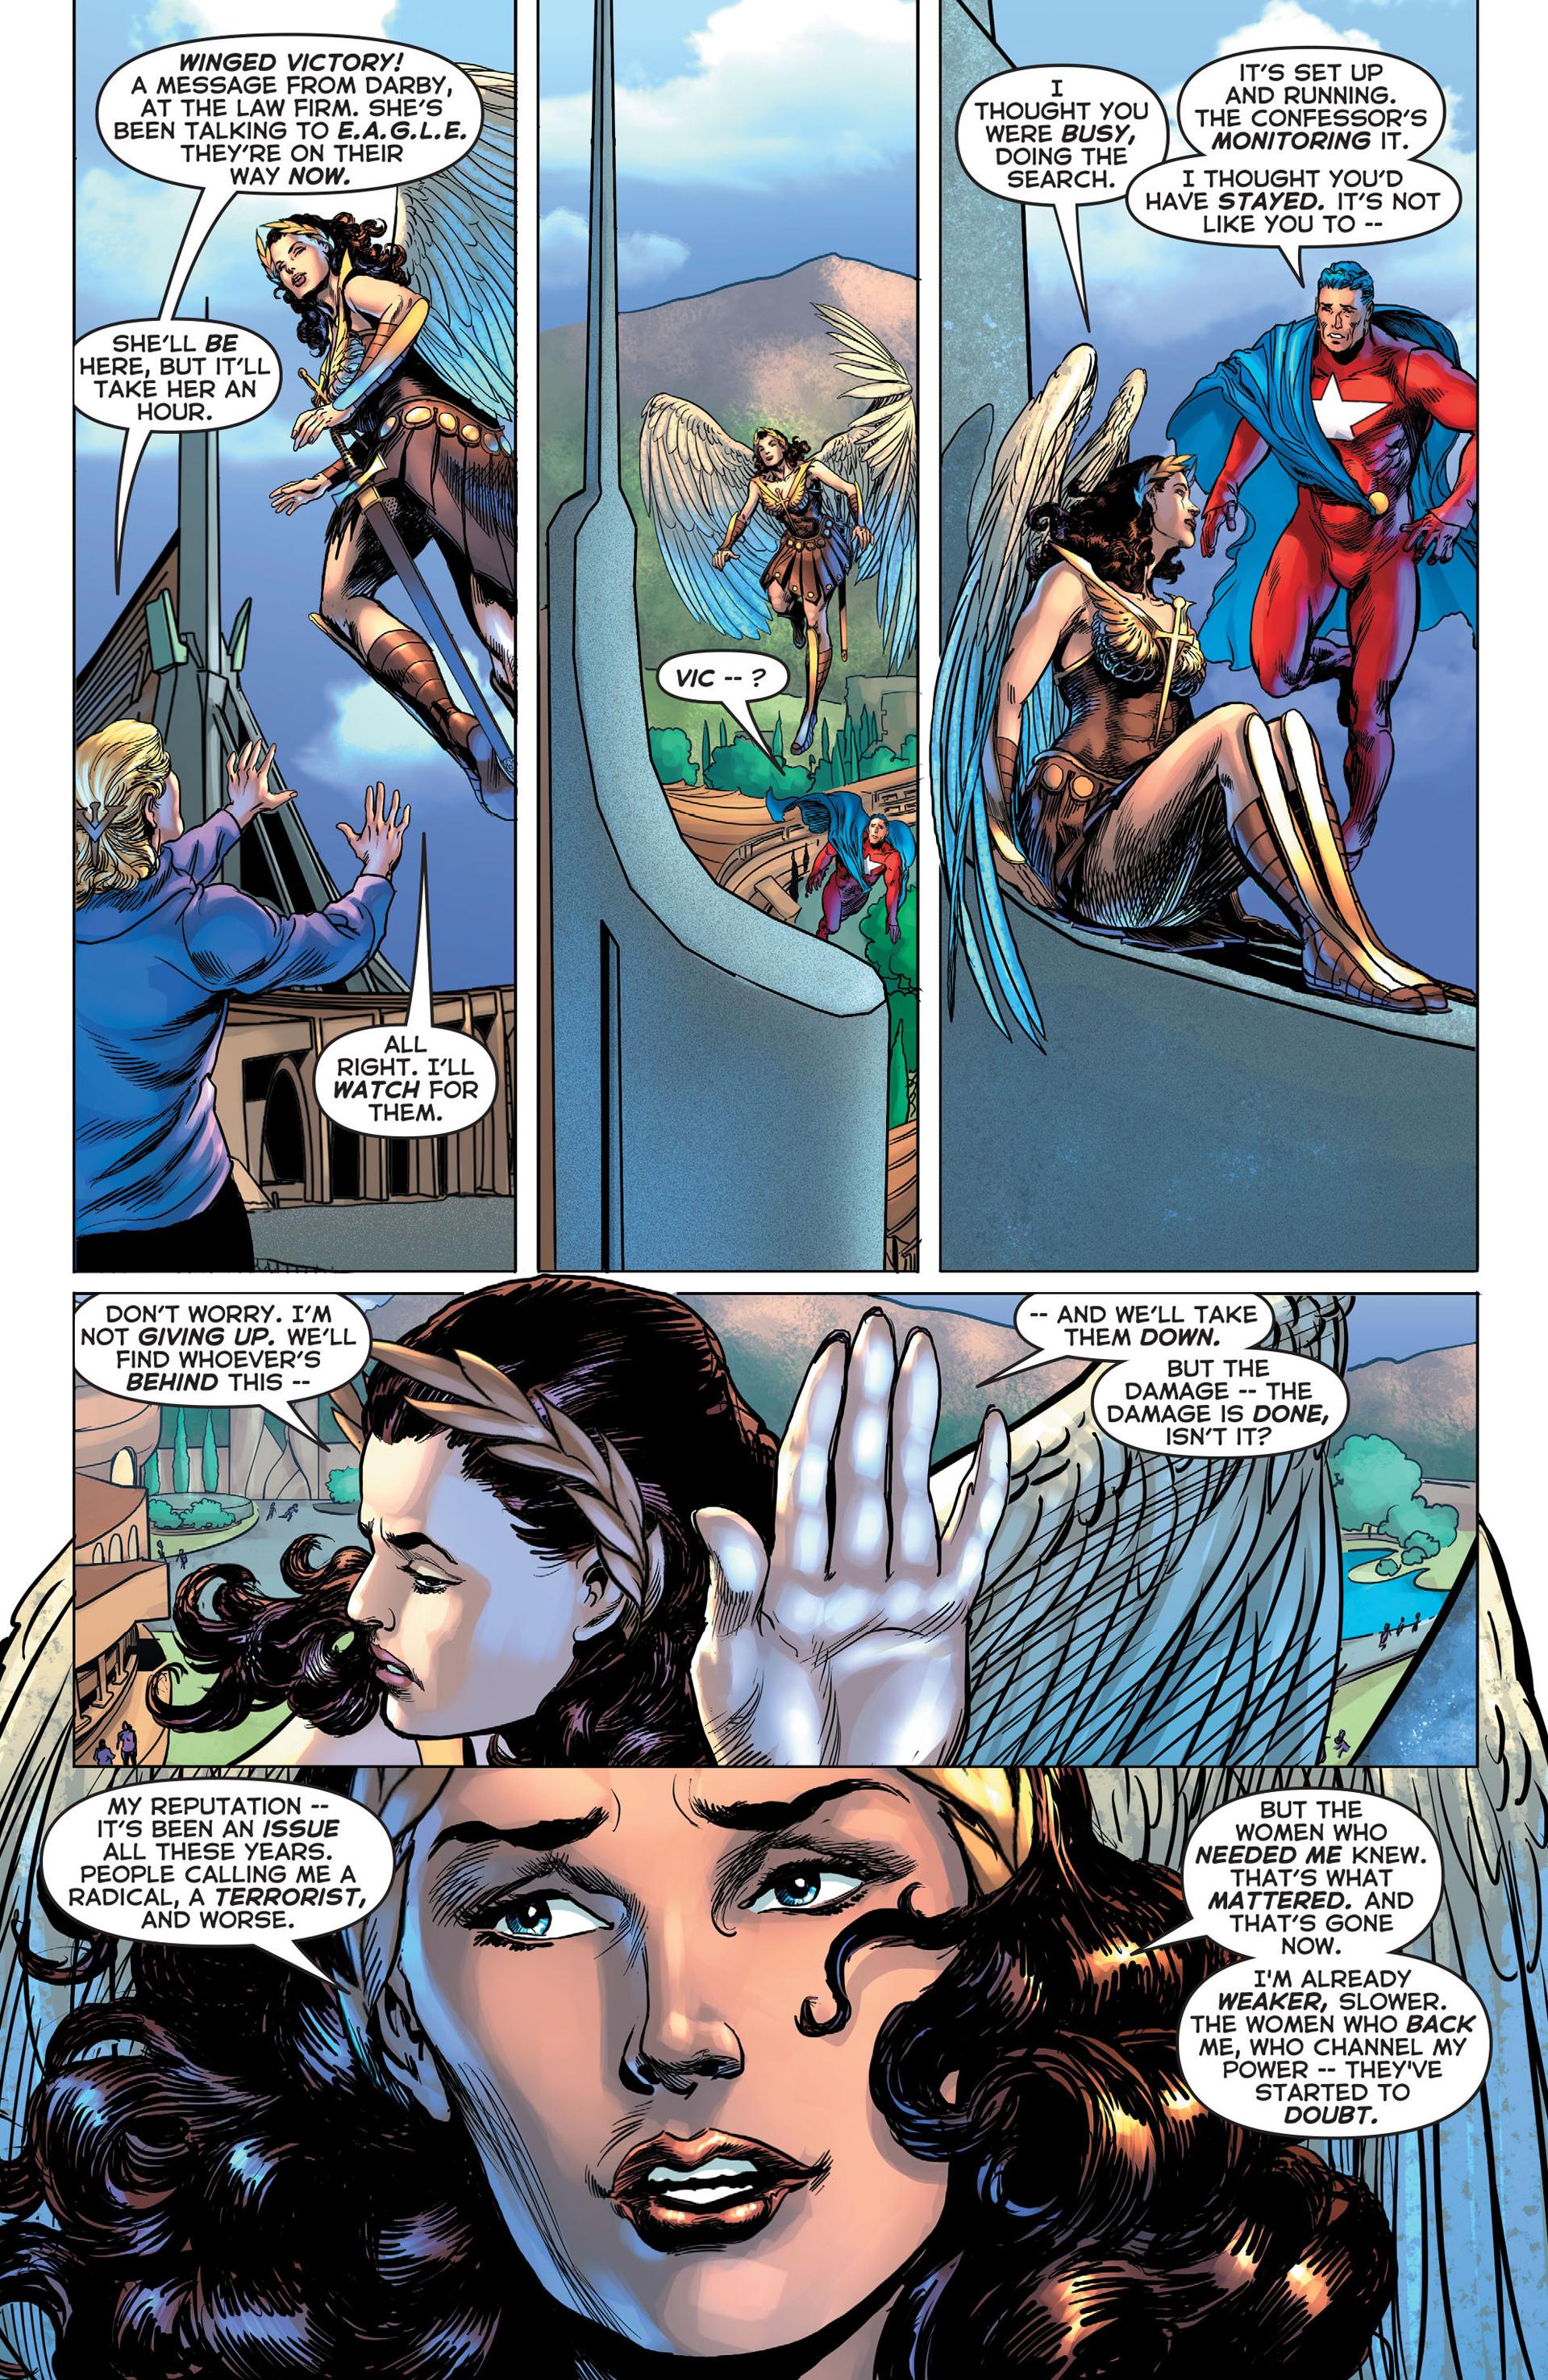 Read online Astro City comic -  Issue #8 - 17